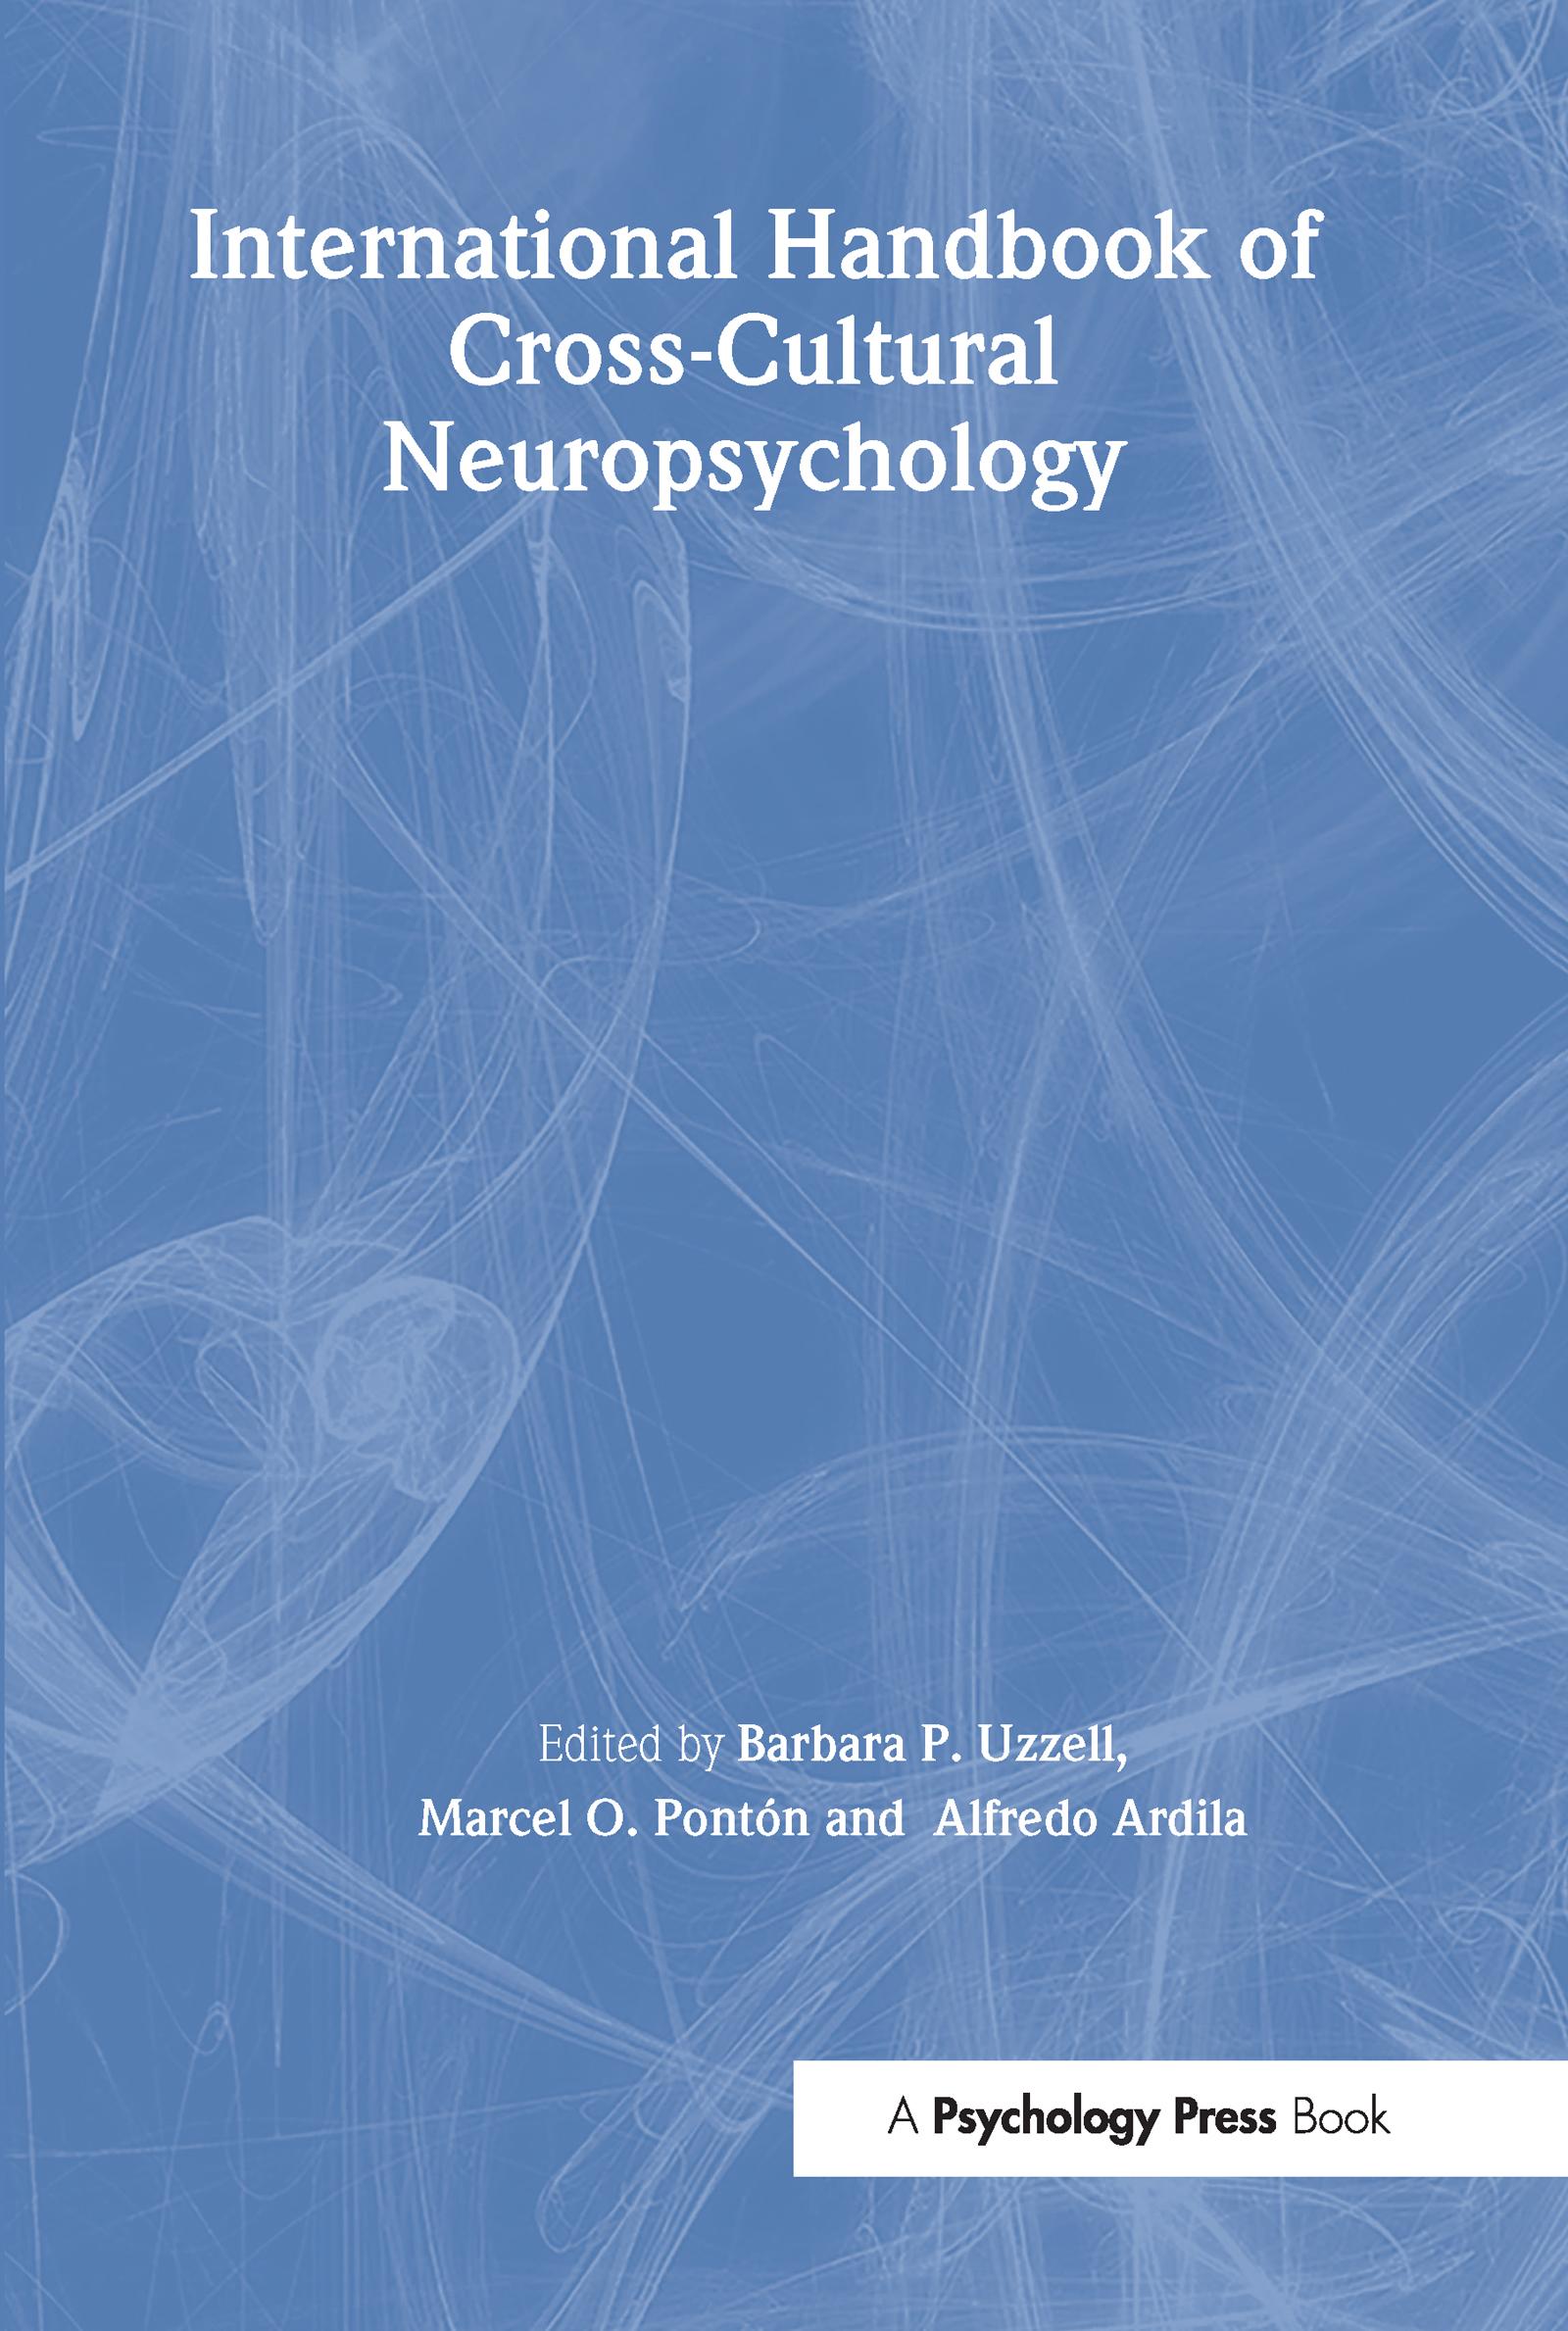 International Handbook of Cross-Cultural Neuropsychology: 1st Edition (Paperback) book cover